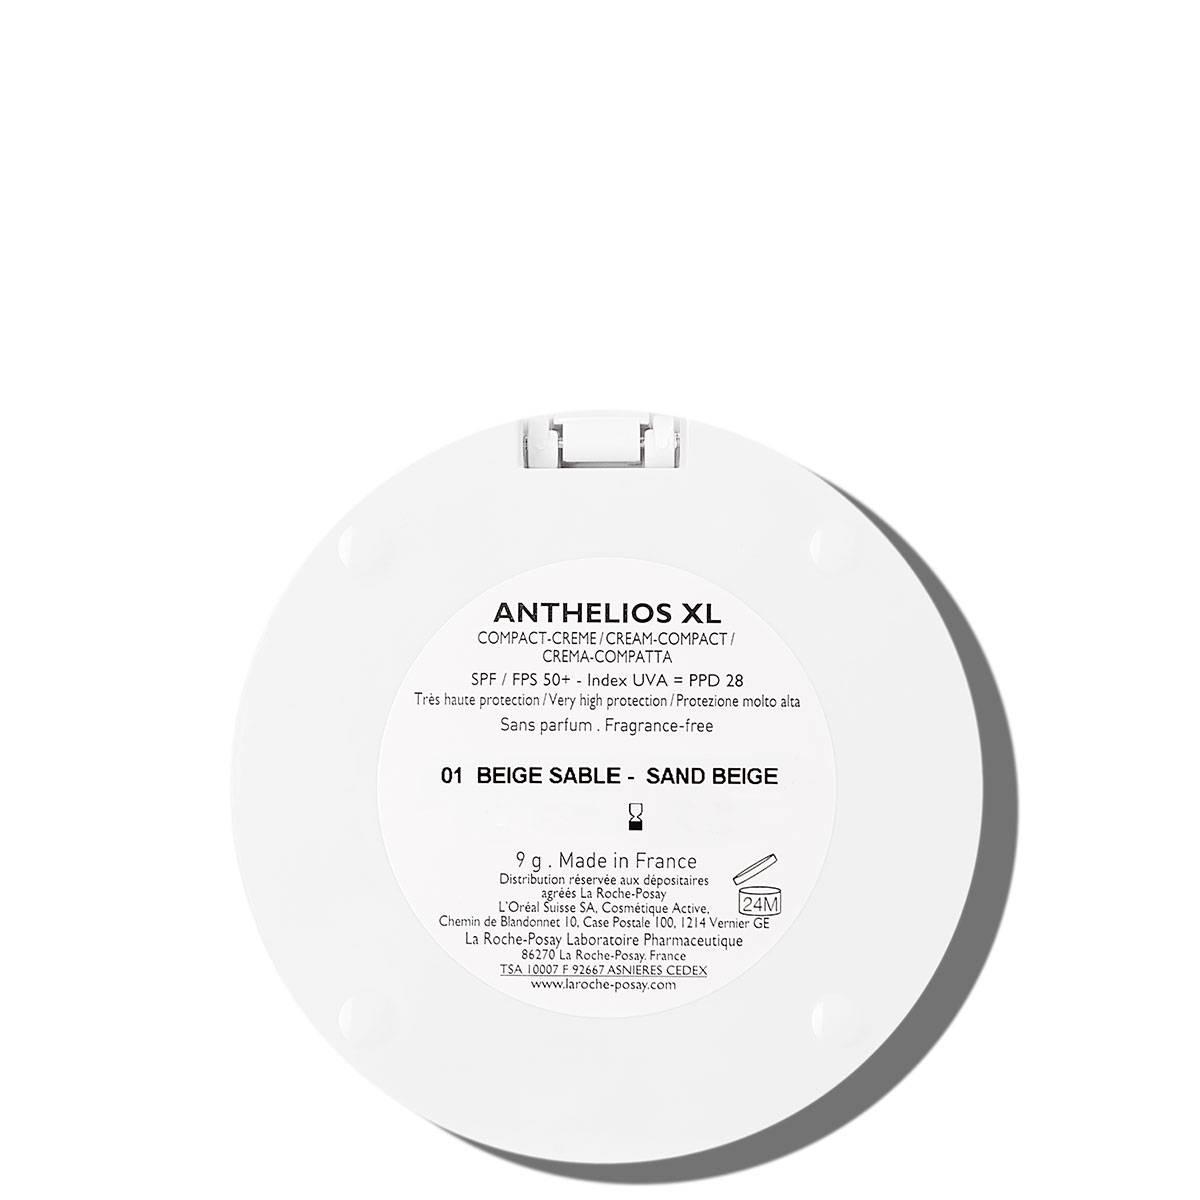 La Roche Posay ProductPage Sun Anthelios XL Compact Cream Spf50 Shade